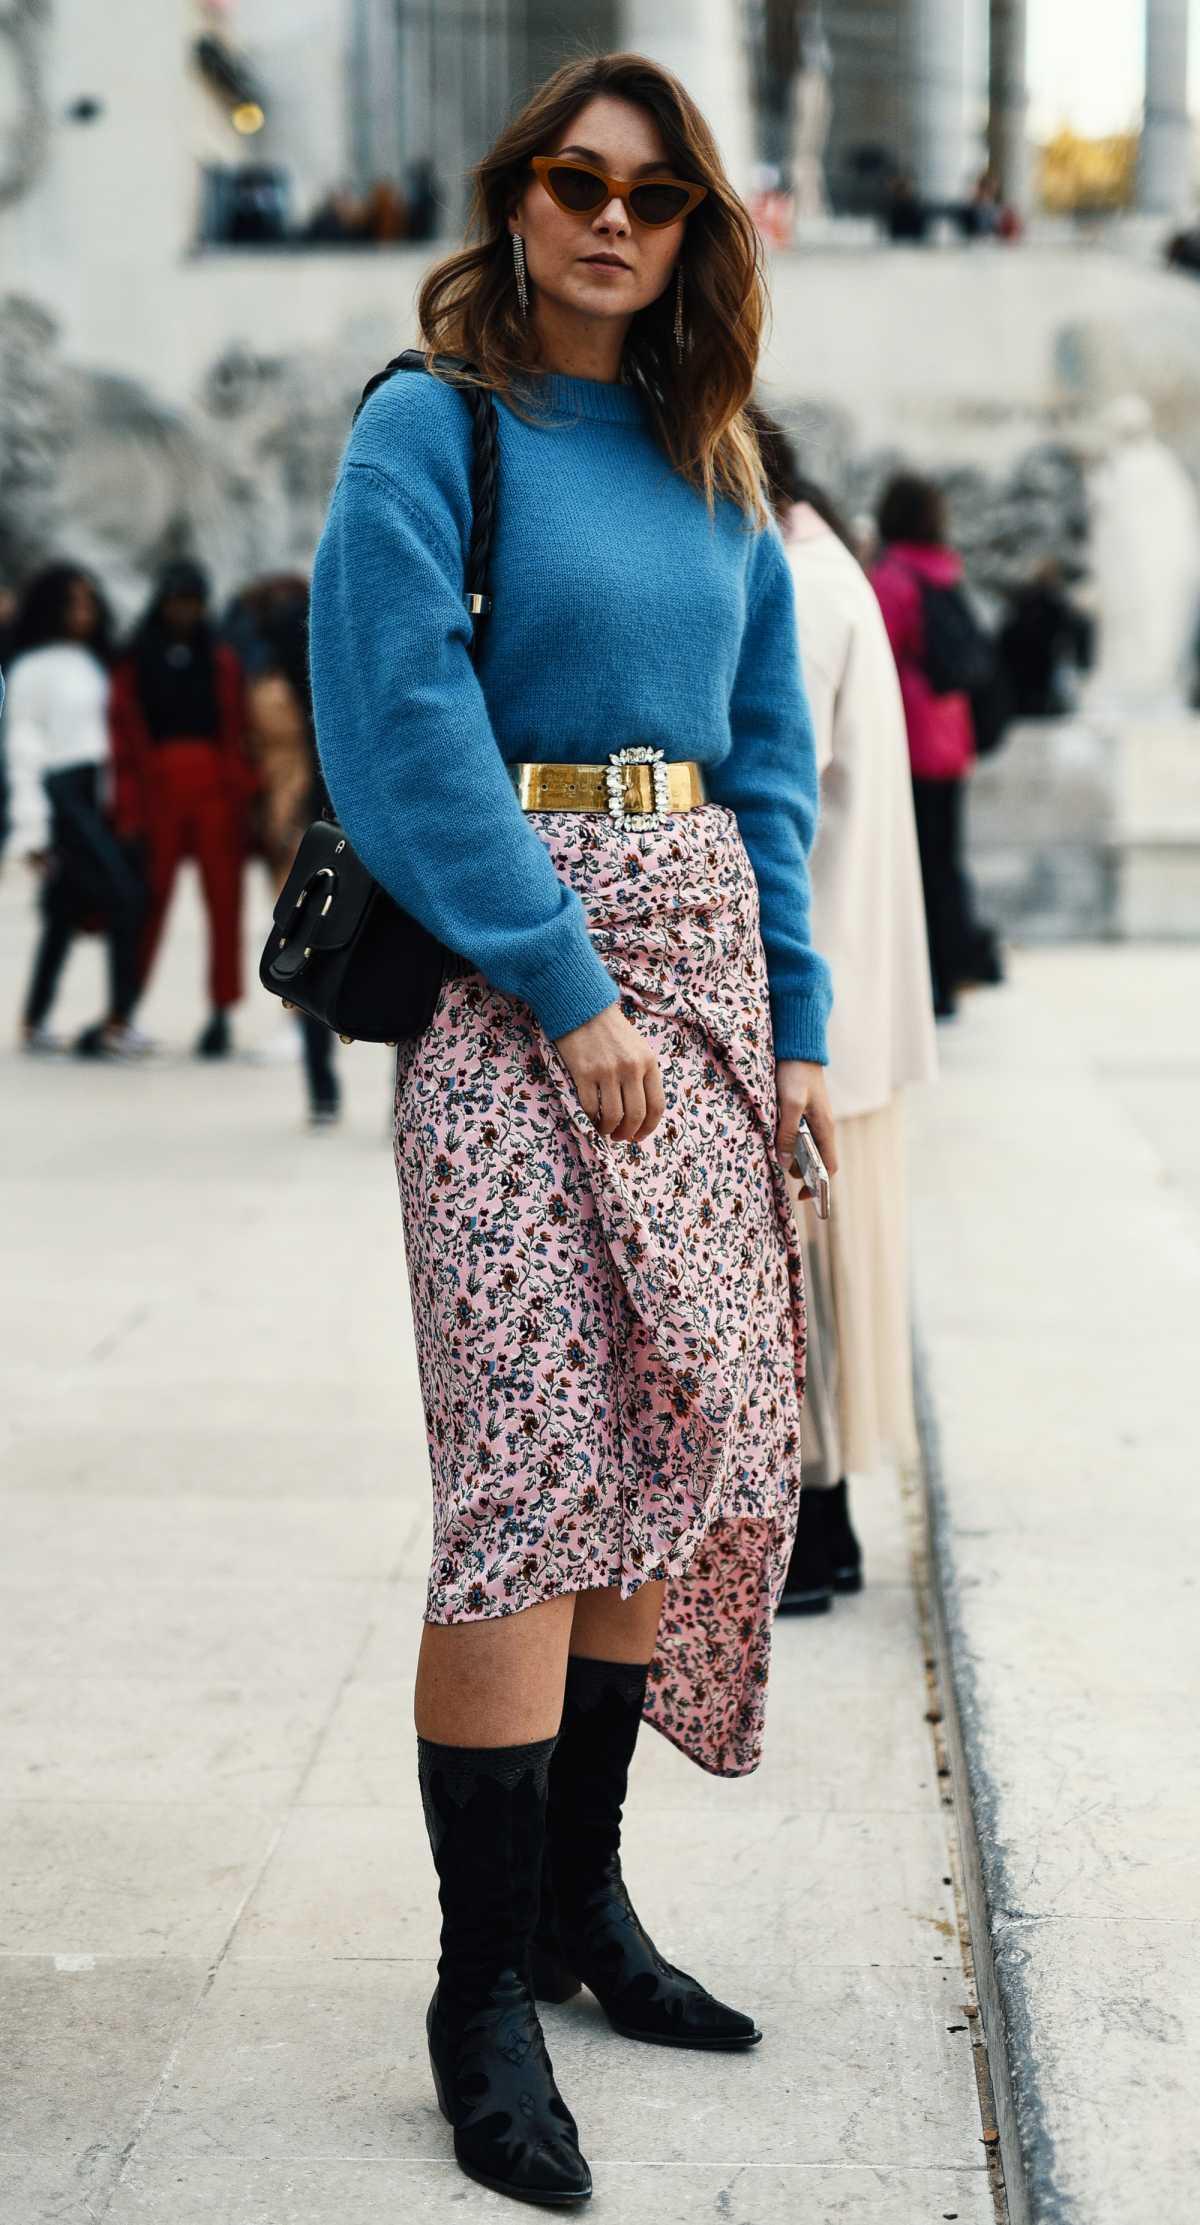 vestido floral com suéter azul